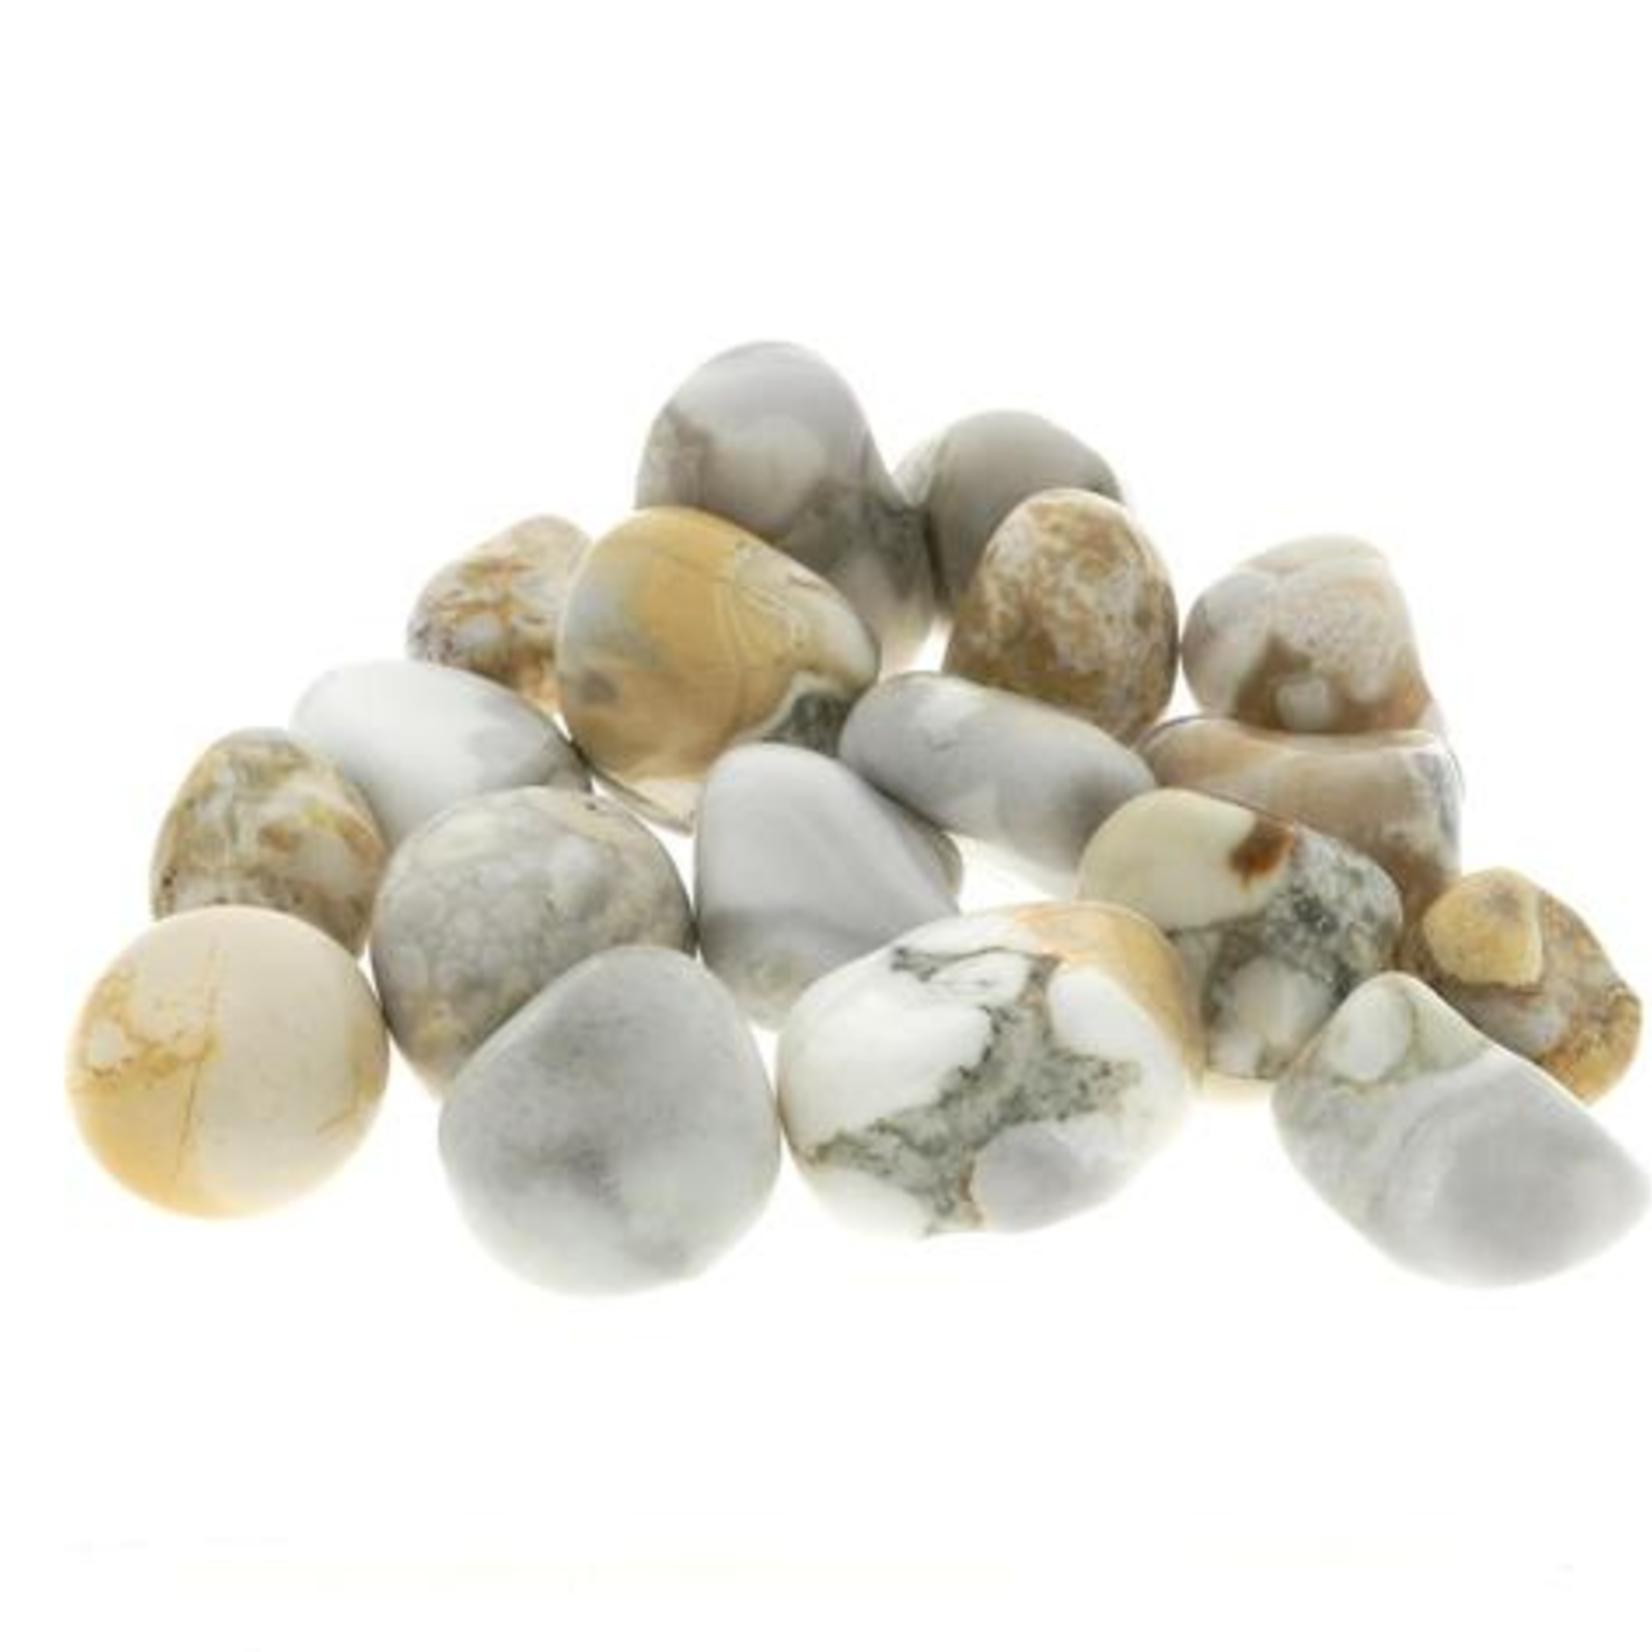 Orbicular Jasper Tumble Stone - M